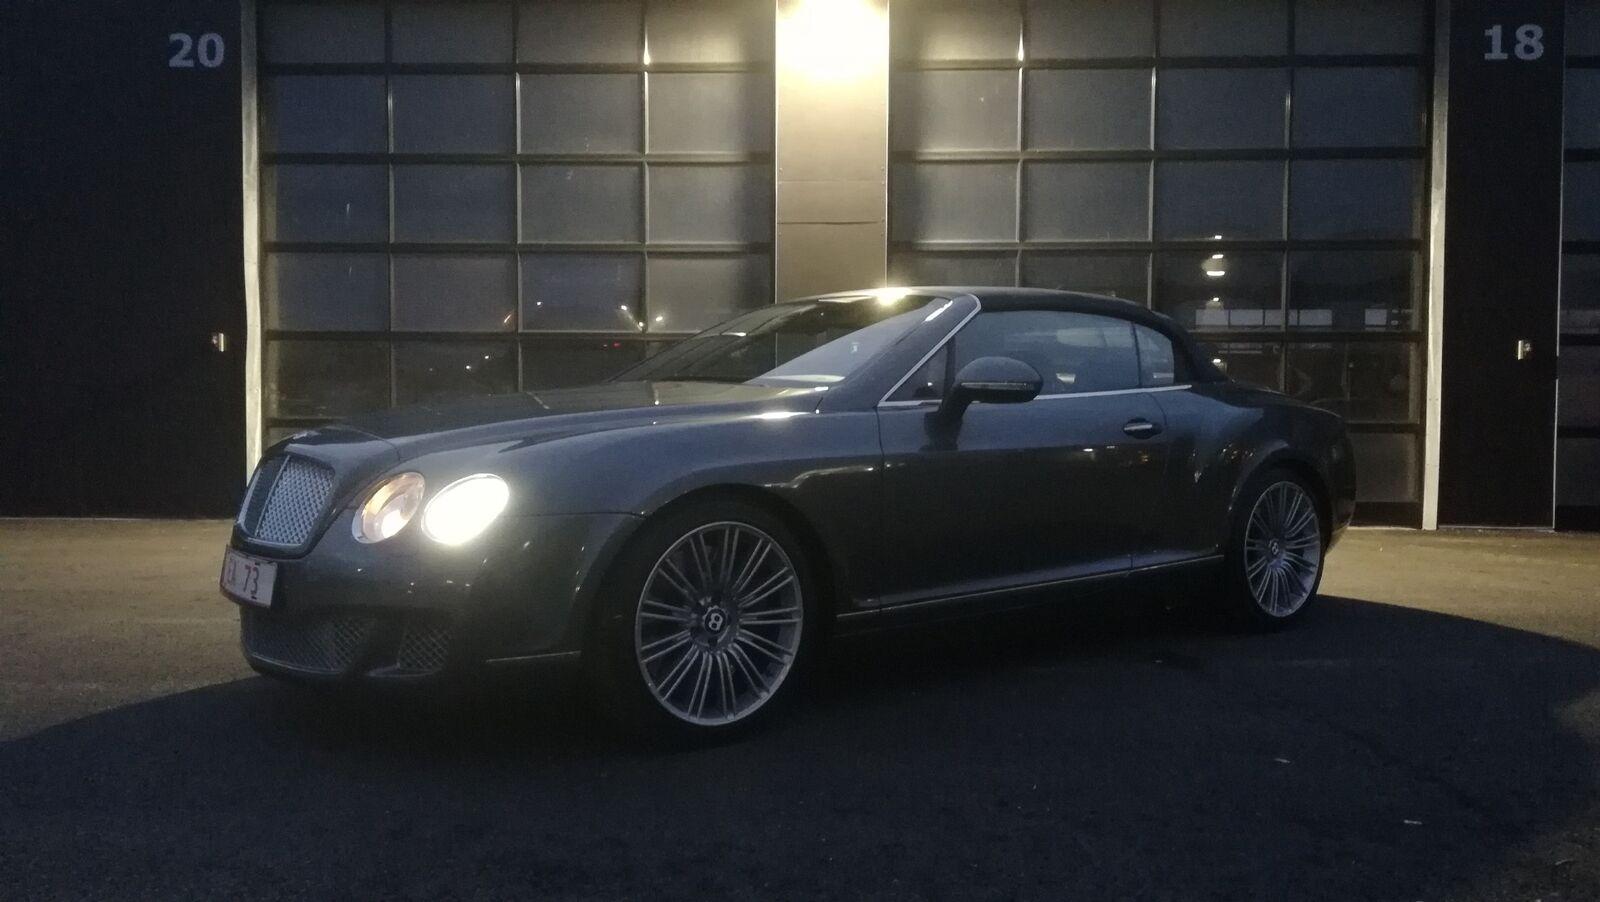 Bentley Continental GTC 6,0 Speed aut. 2d